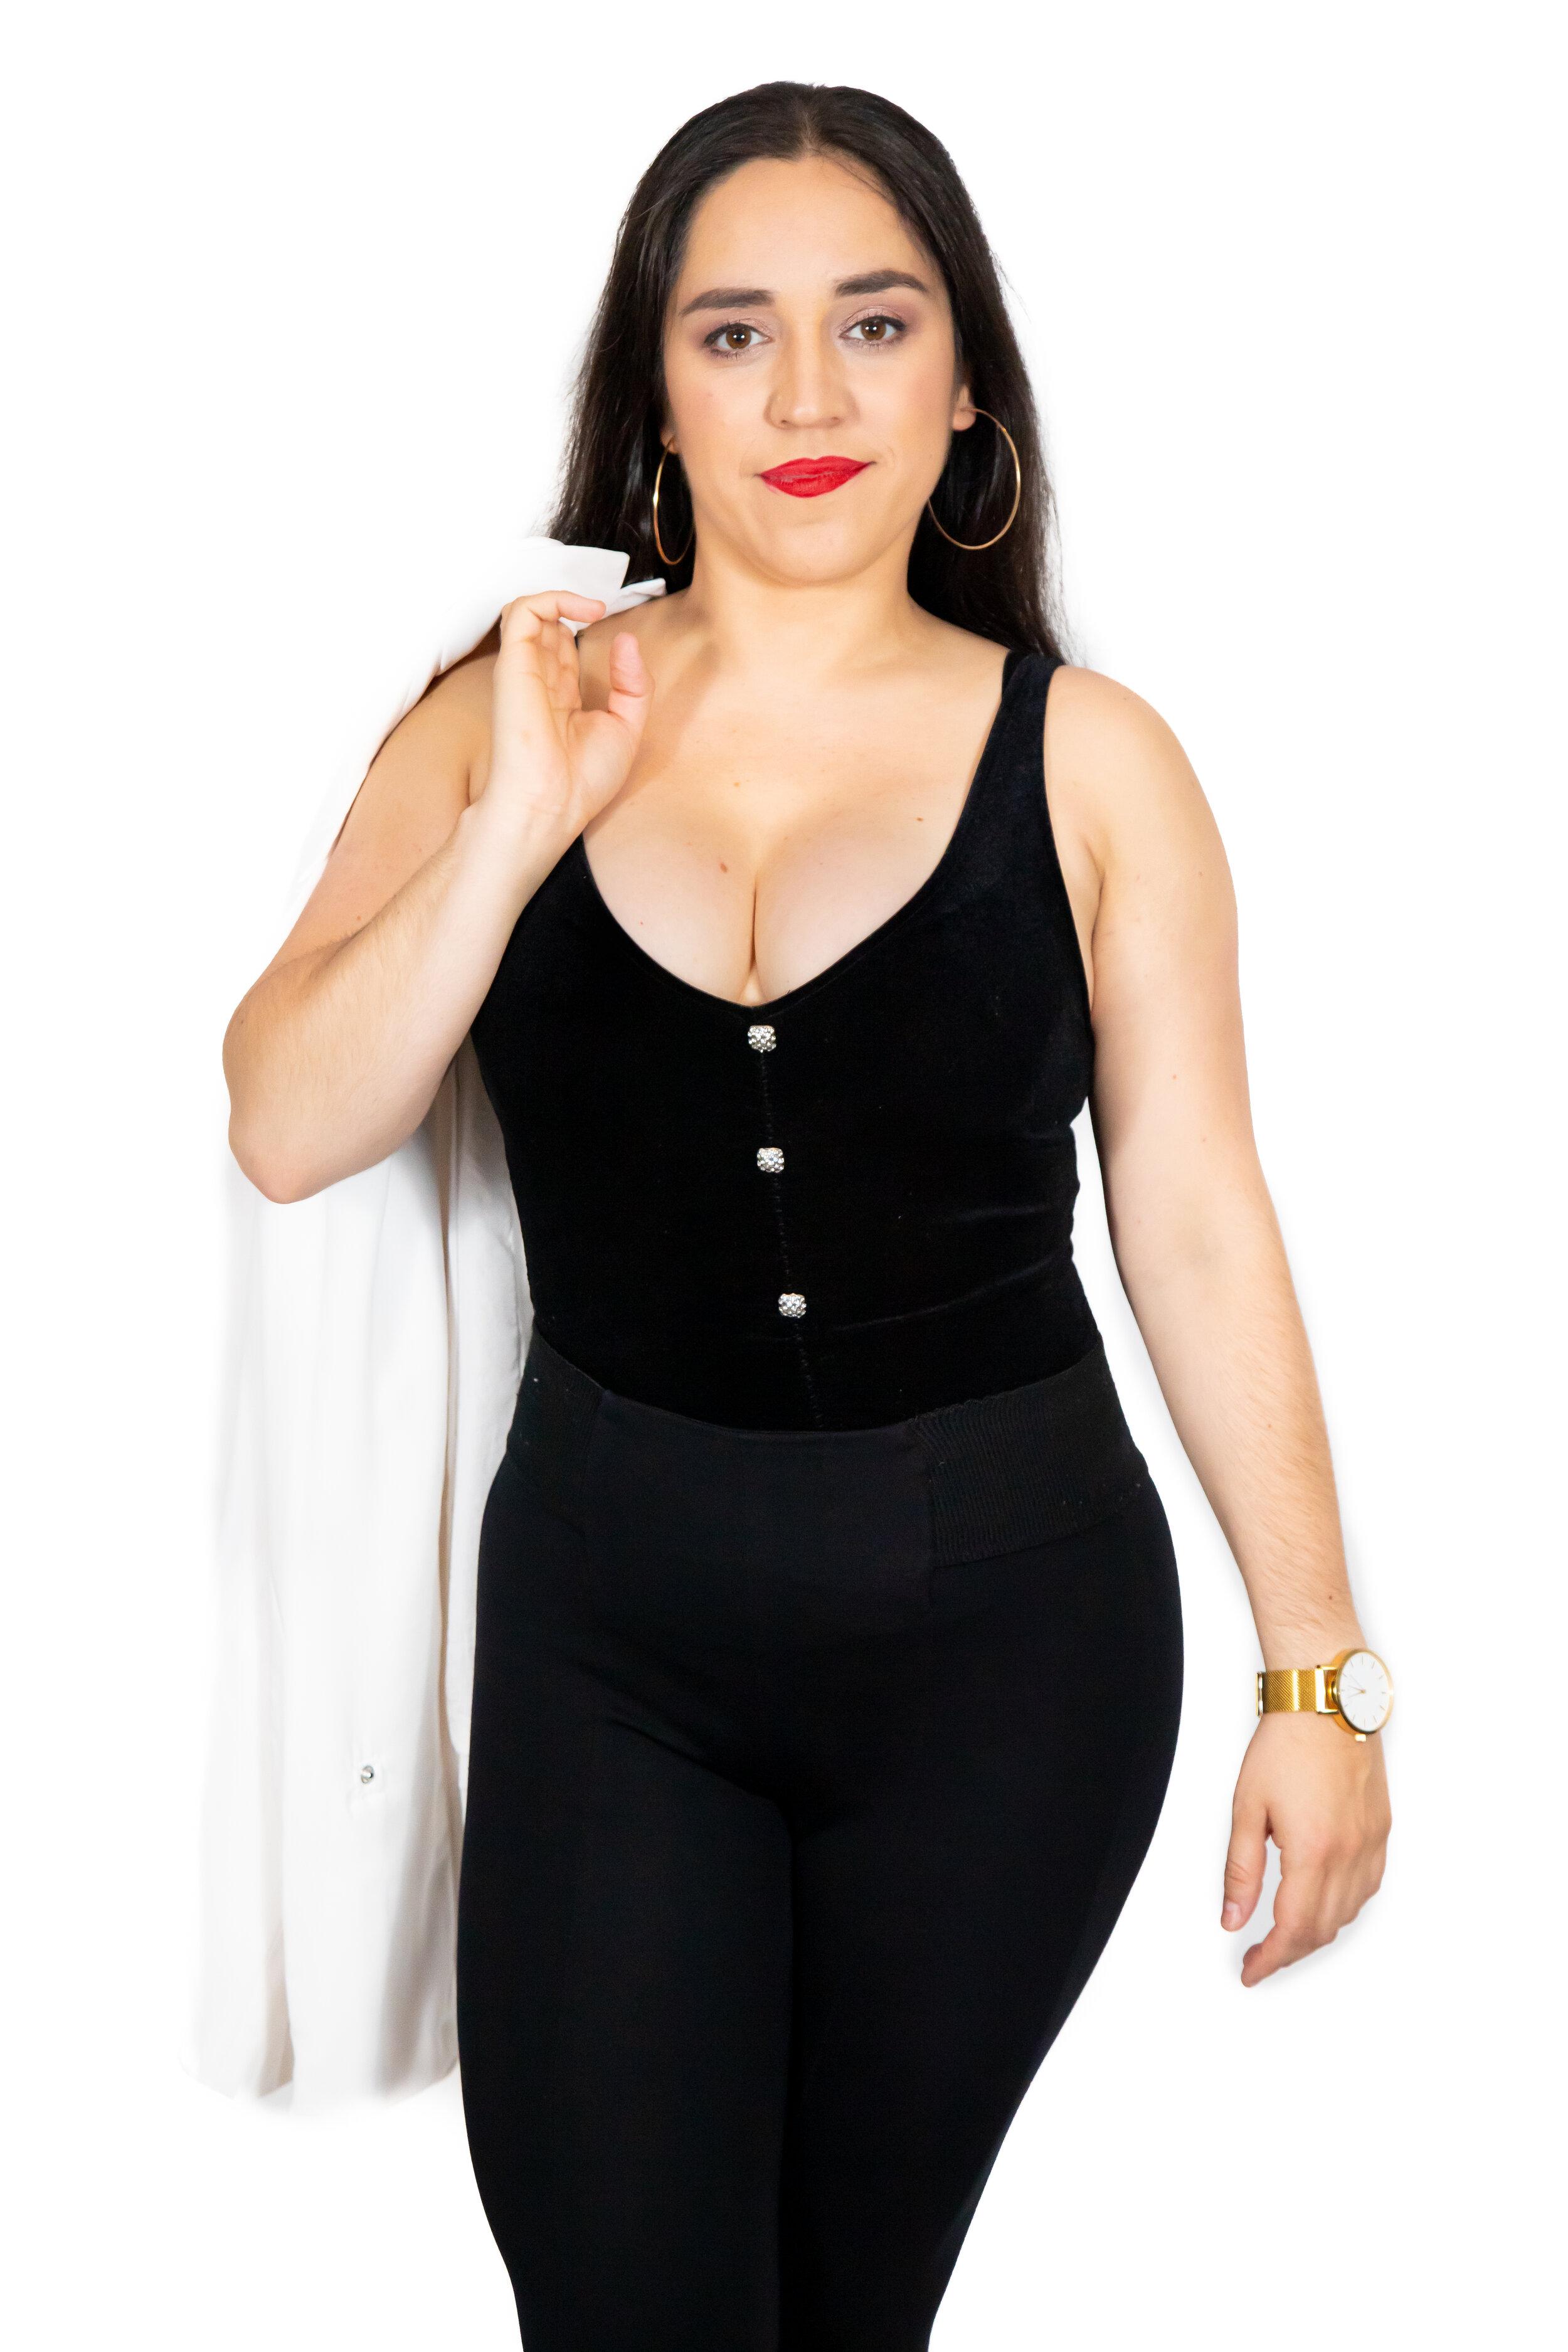 Angelica Duque